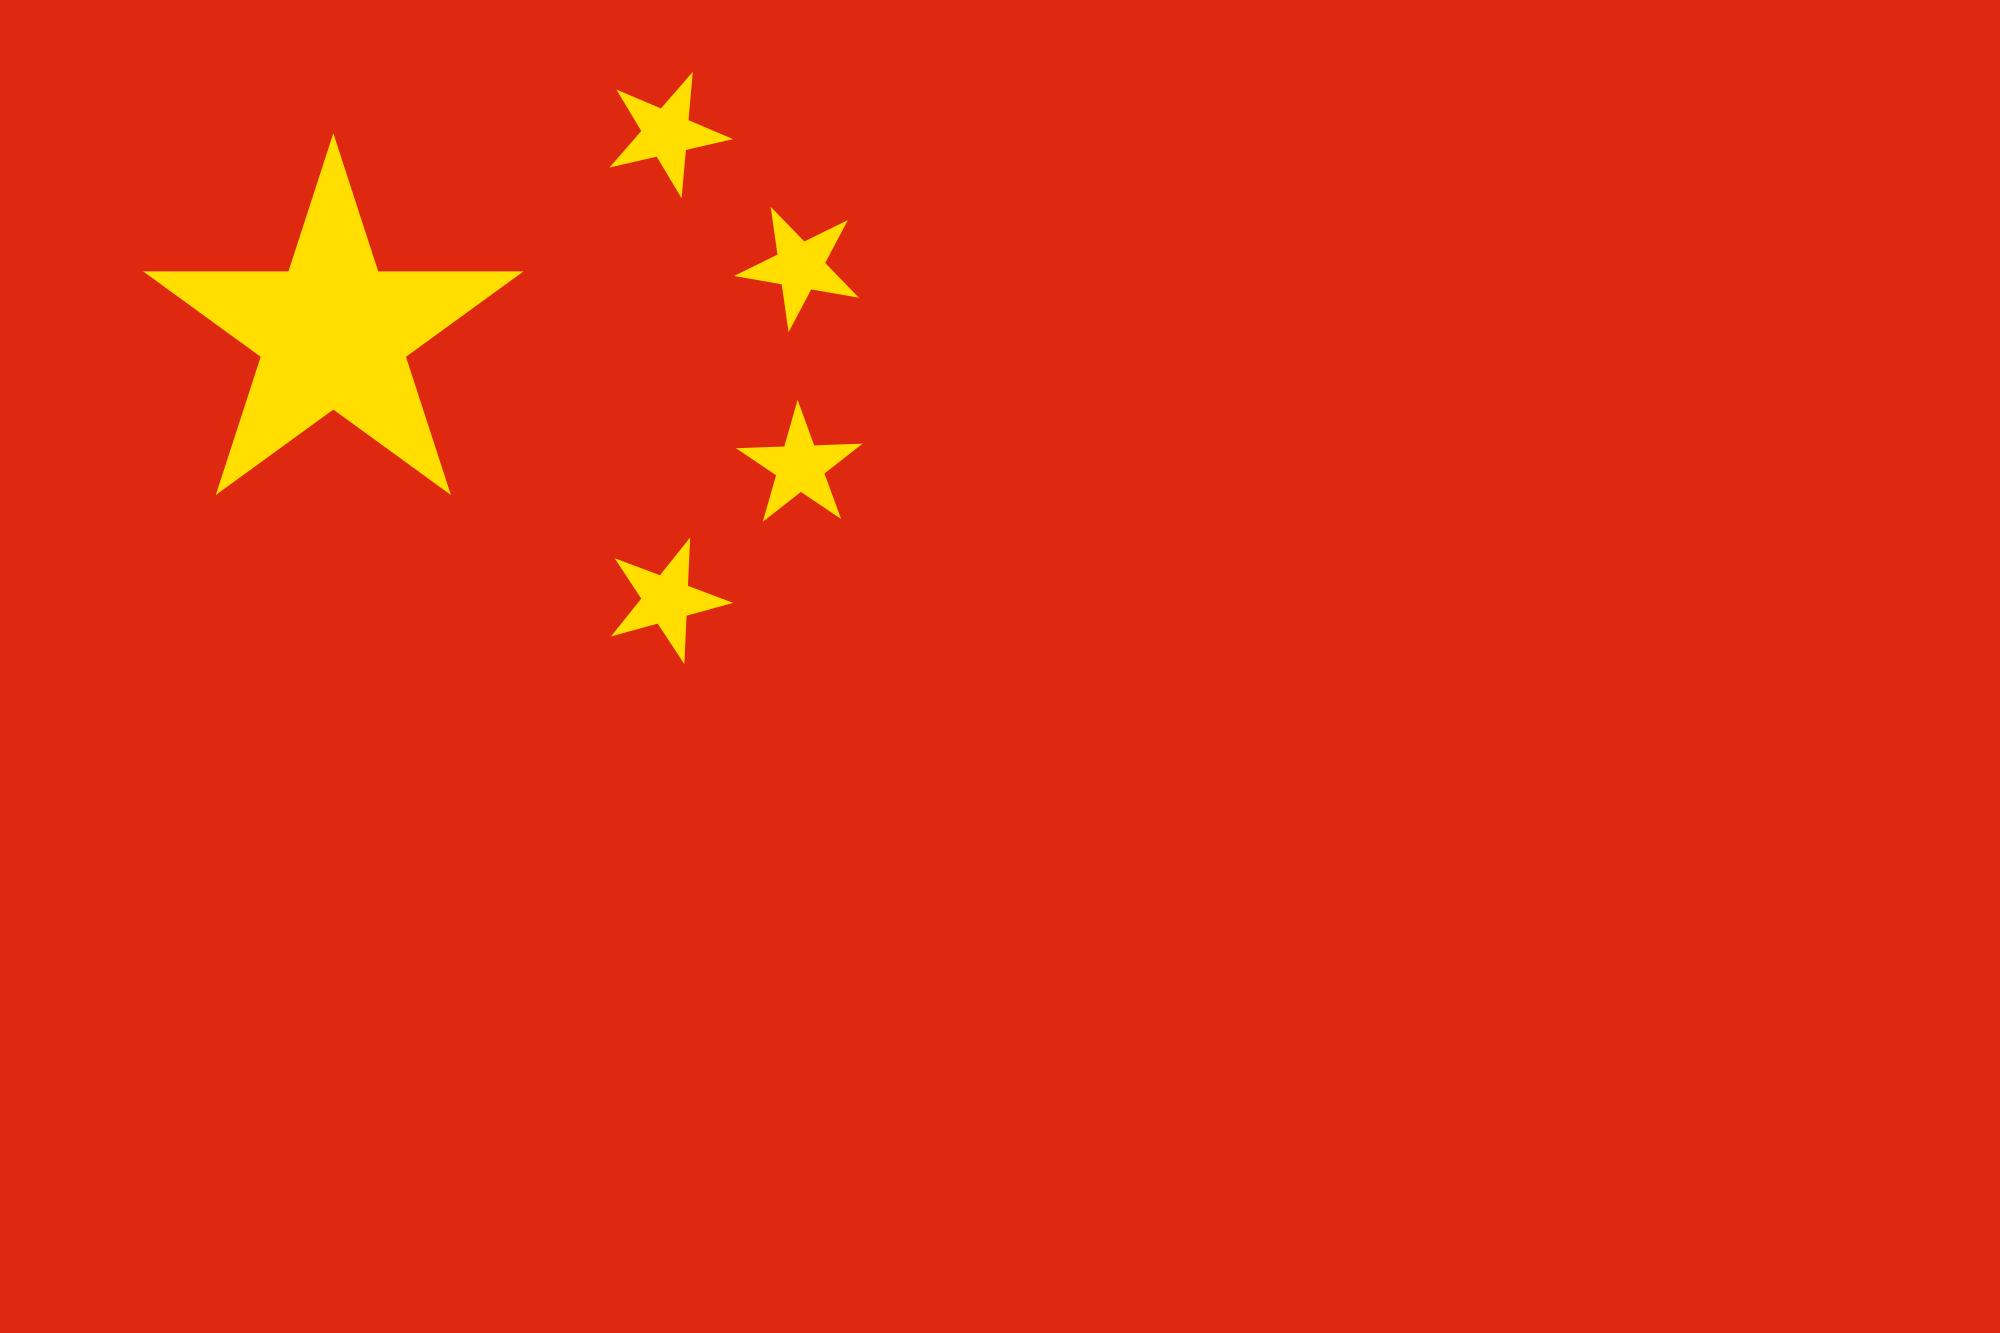 De goedkoopste bewakingscamera uit China